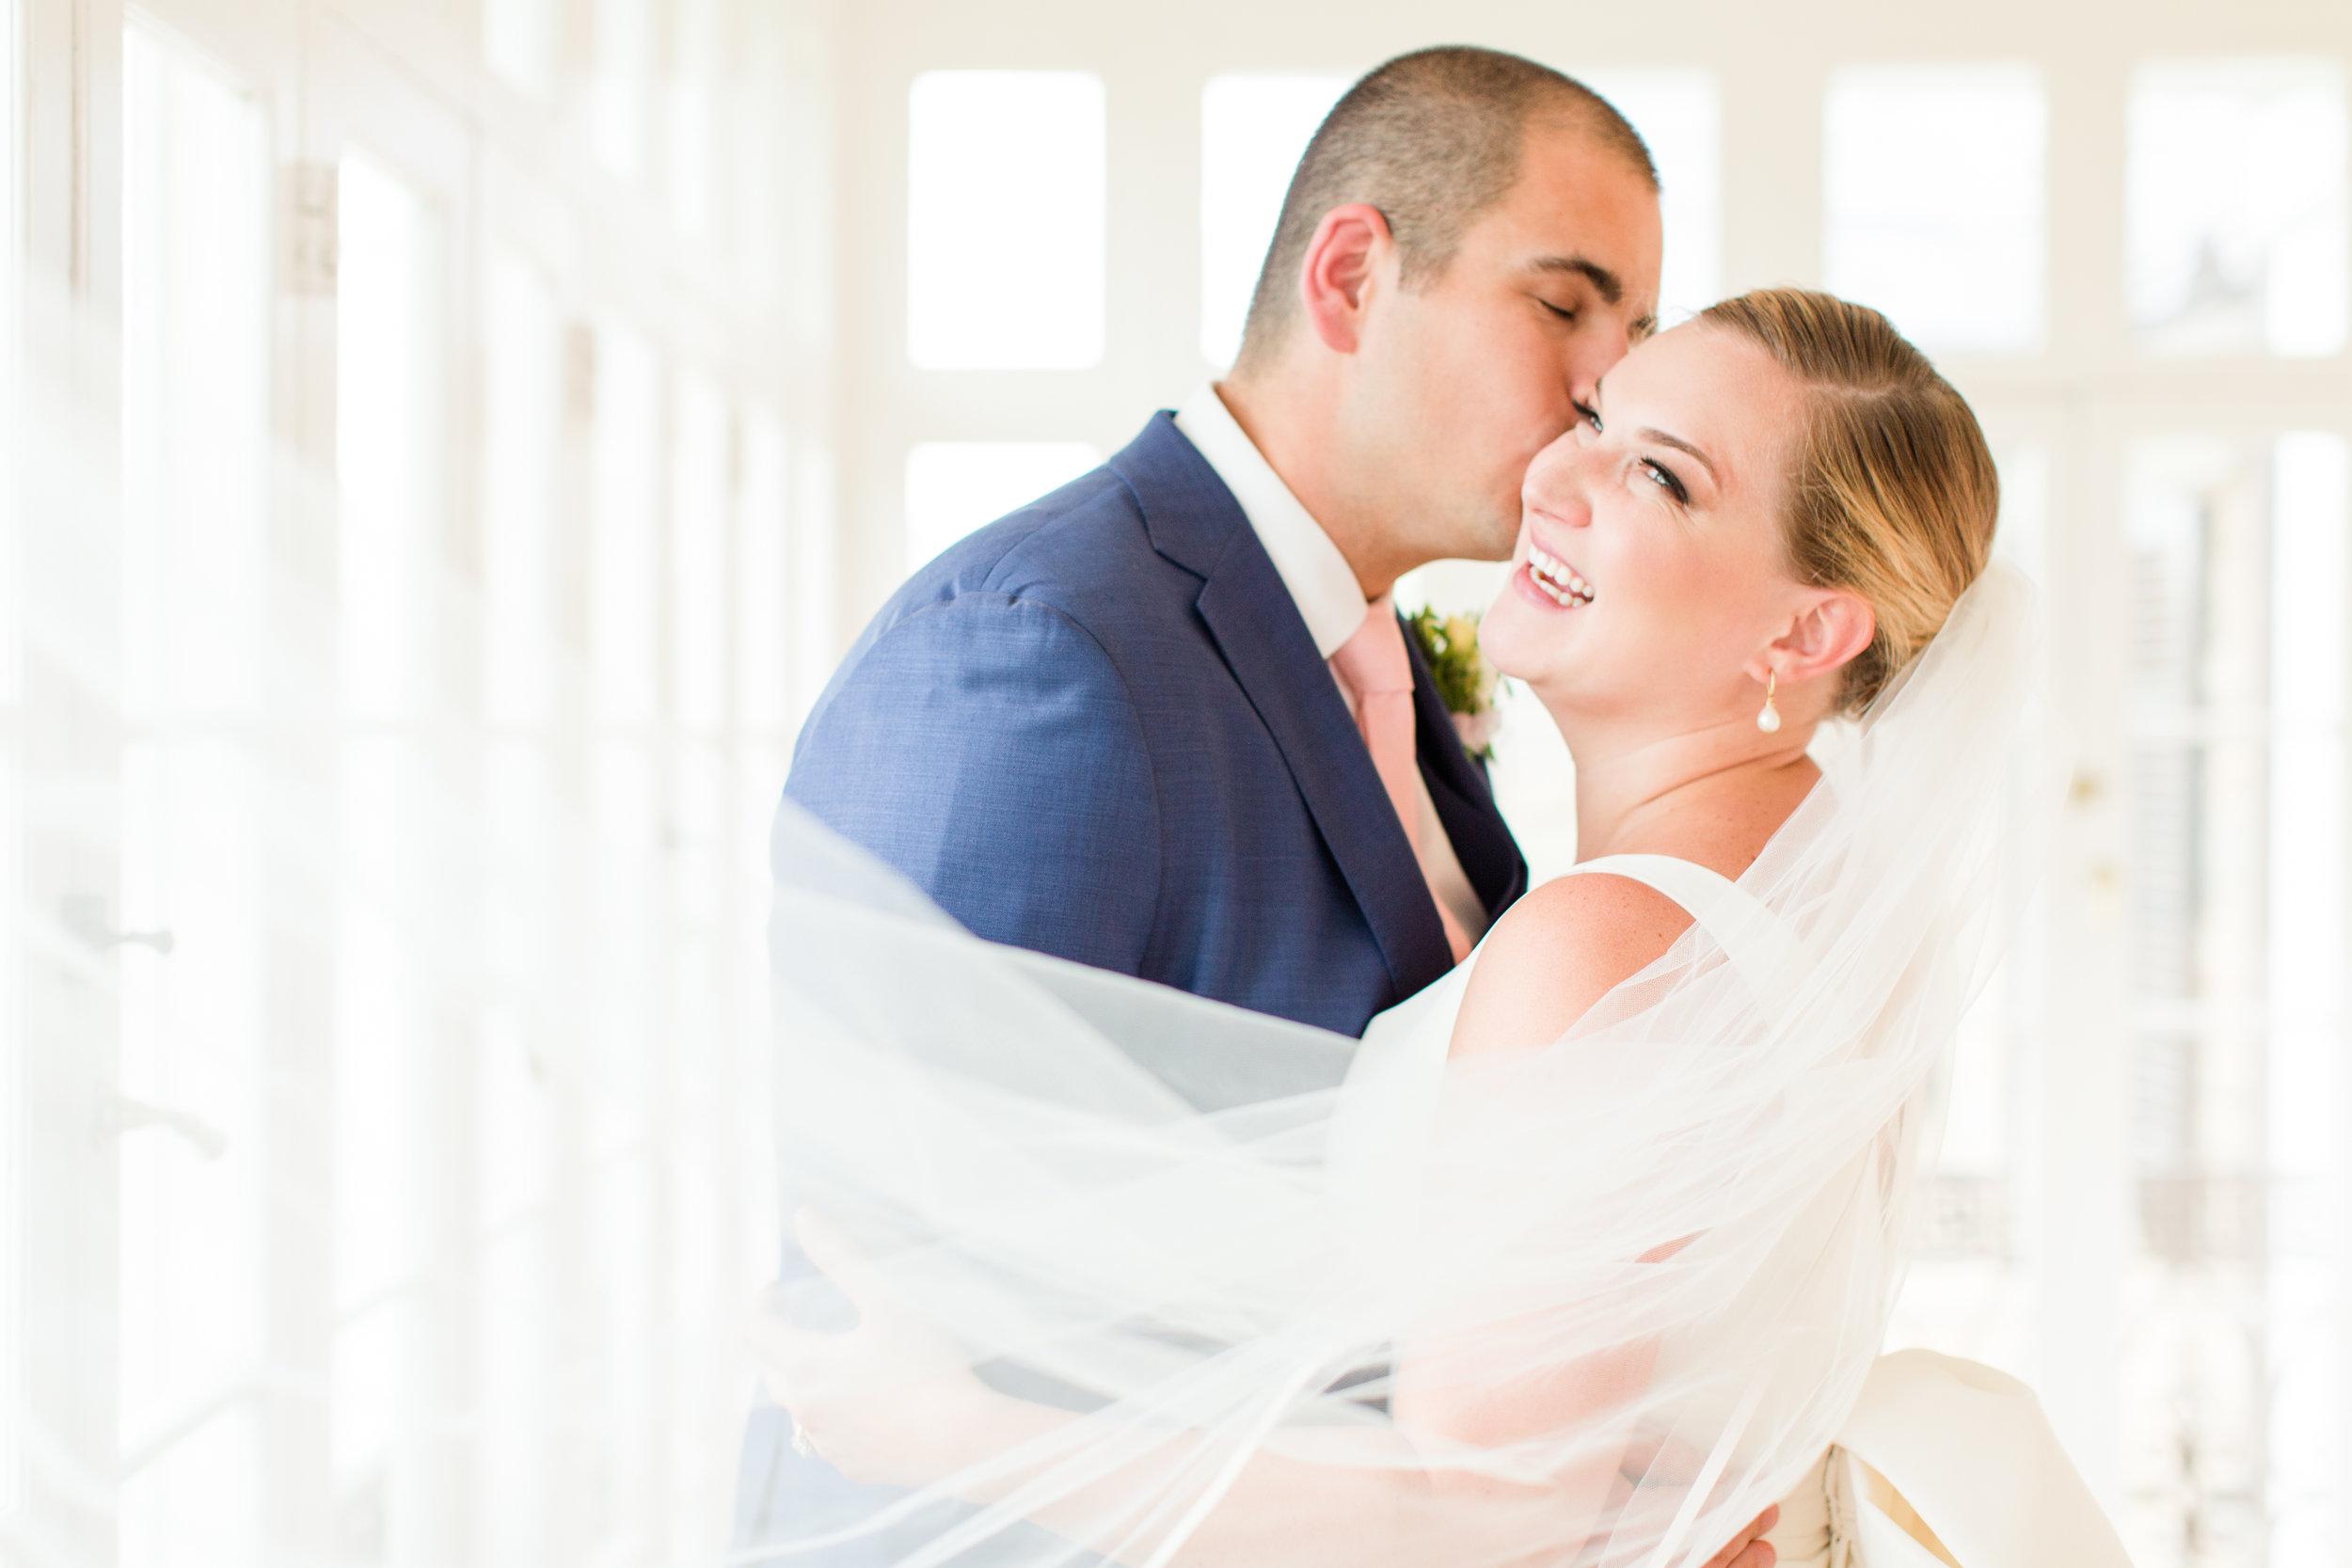 glenview-mansion-rockville-maryland-bourbon-derby-buker-wedding-bride-groom-portraitsbethanne-arthur-photography-photos-122.jpg